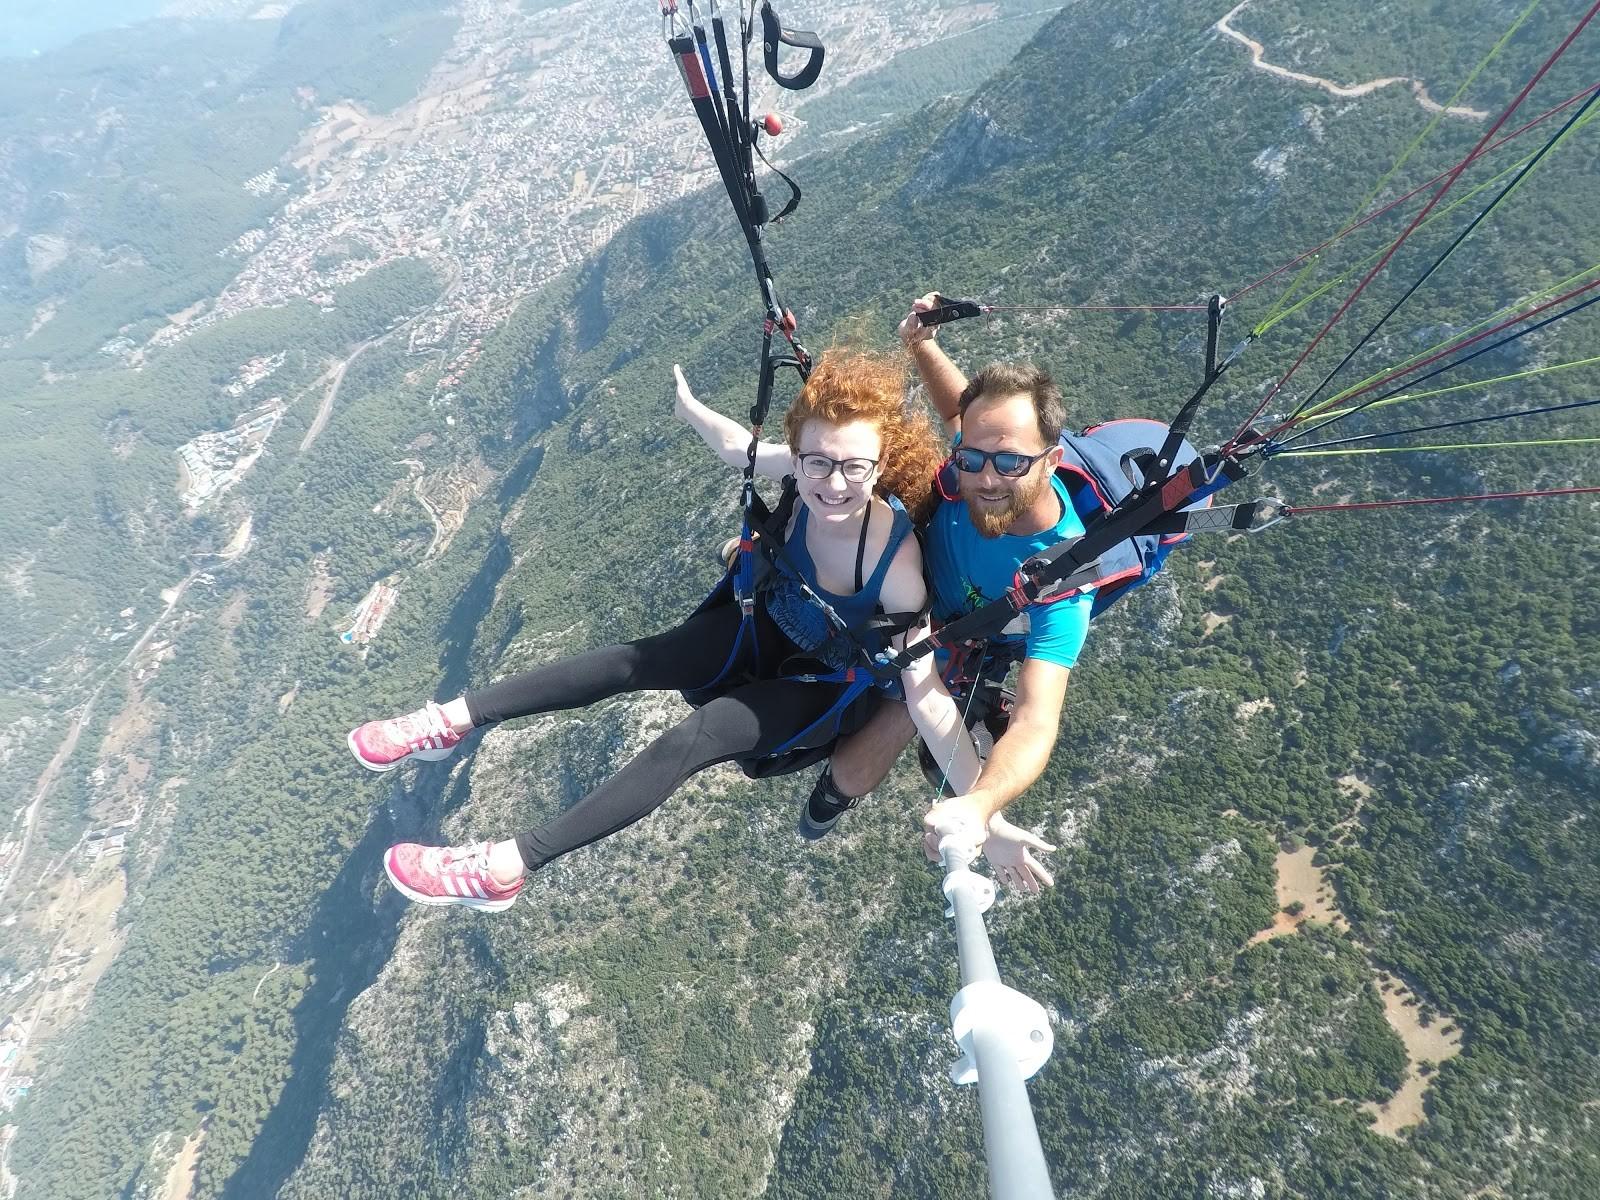 Fethiye Paragliding Experience ⋆ ToursCE Travel Blog